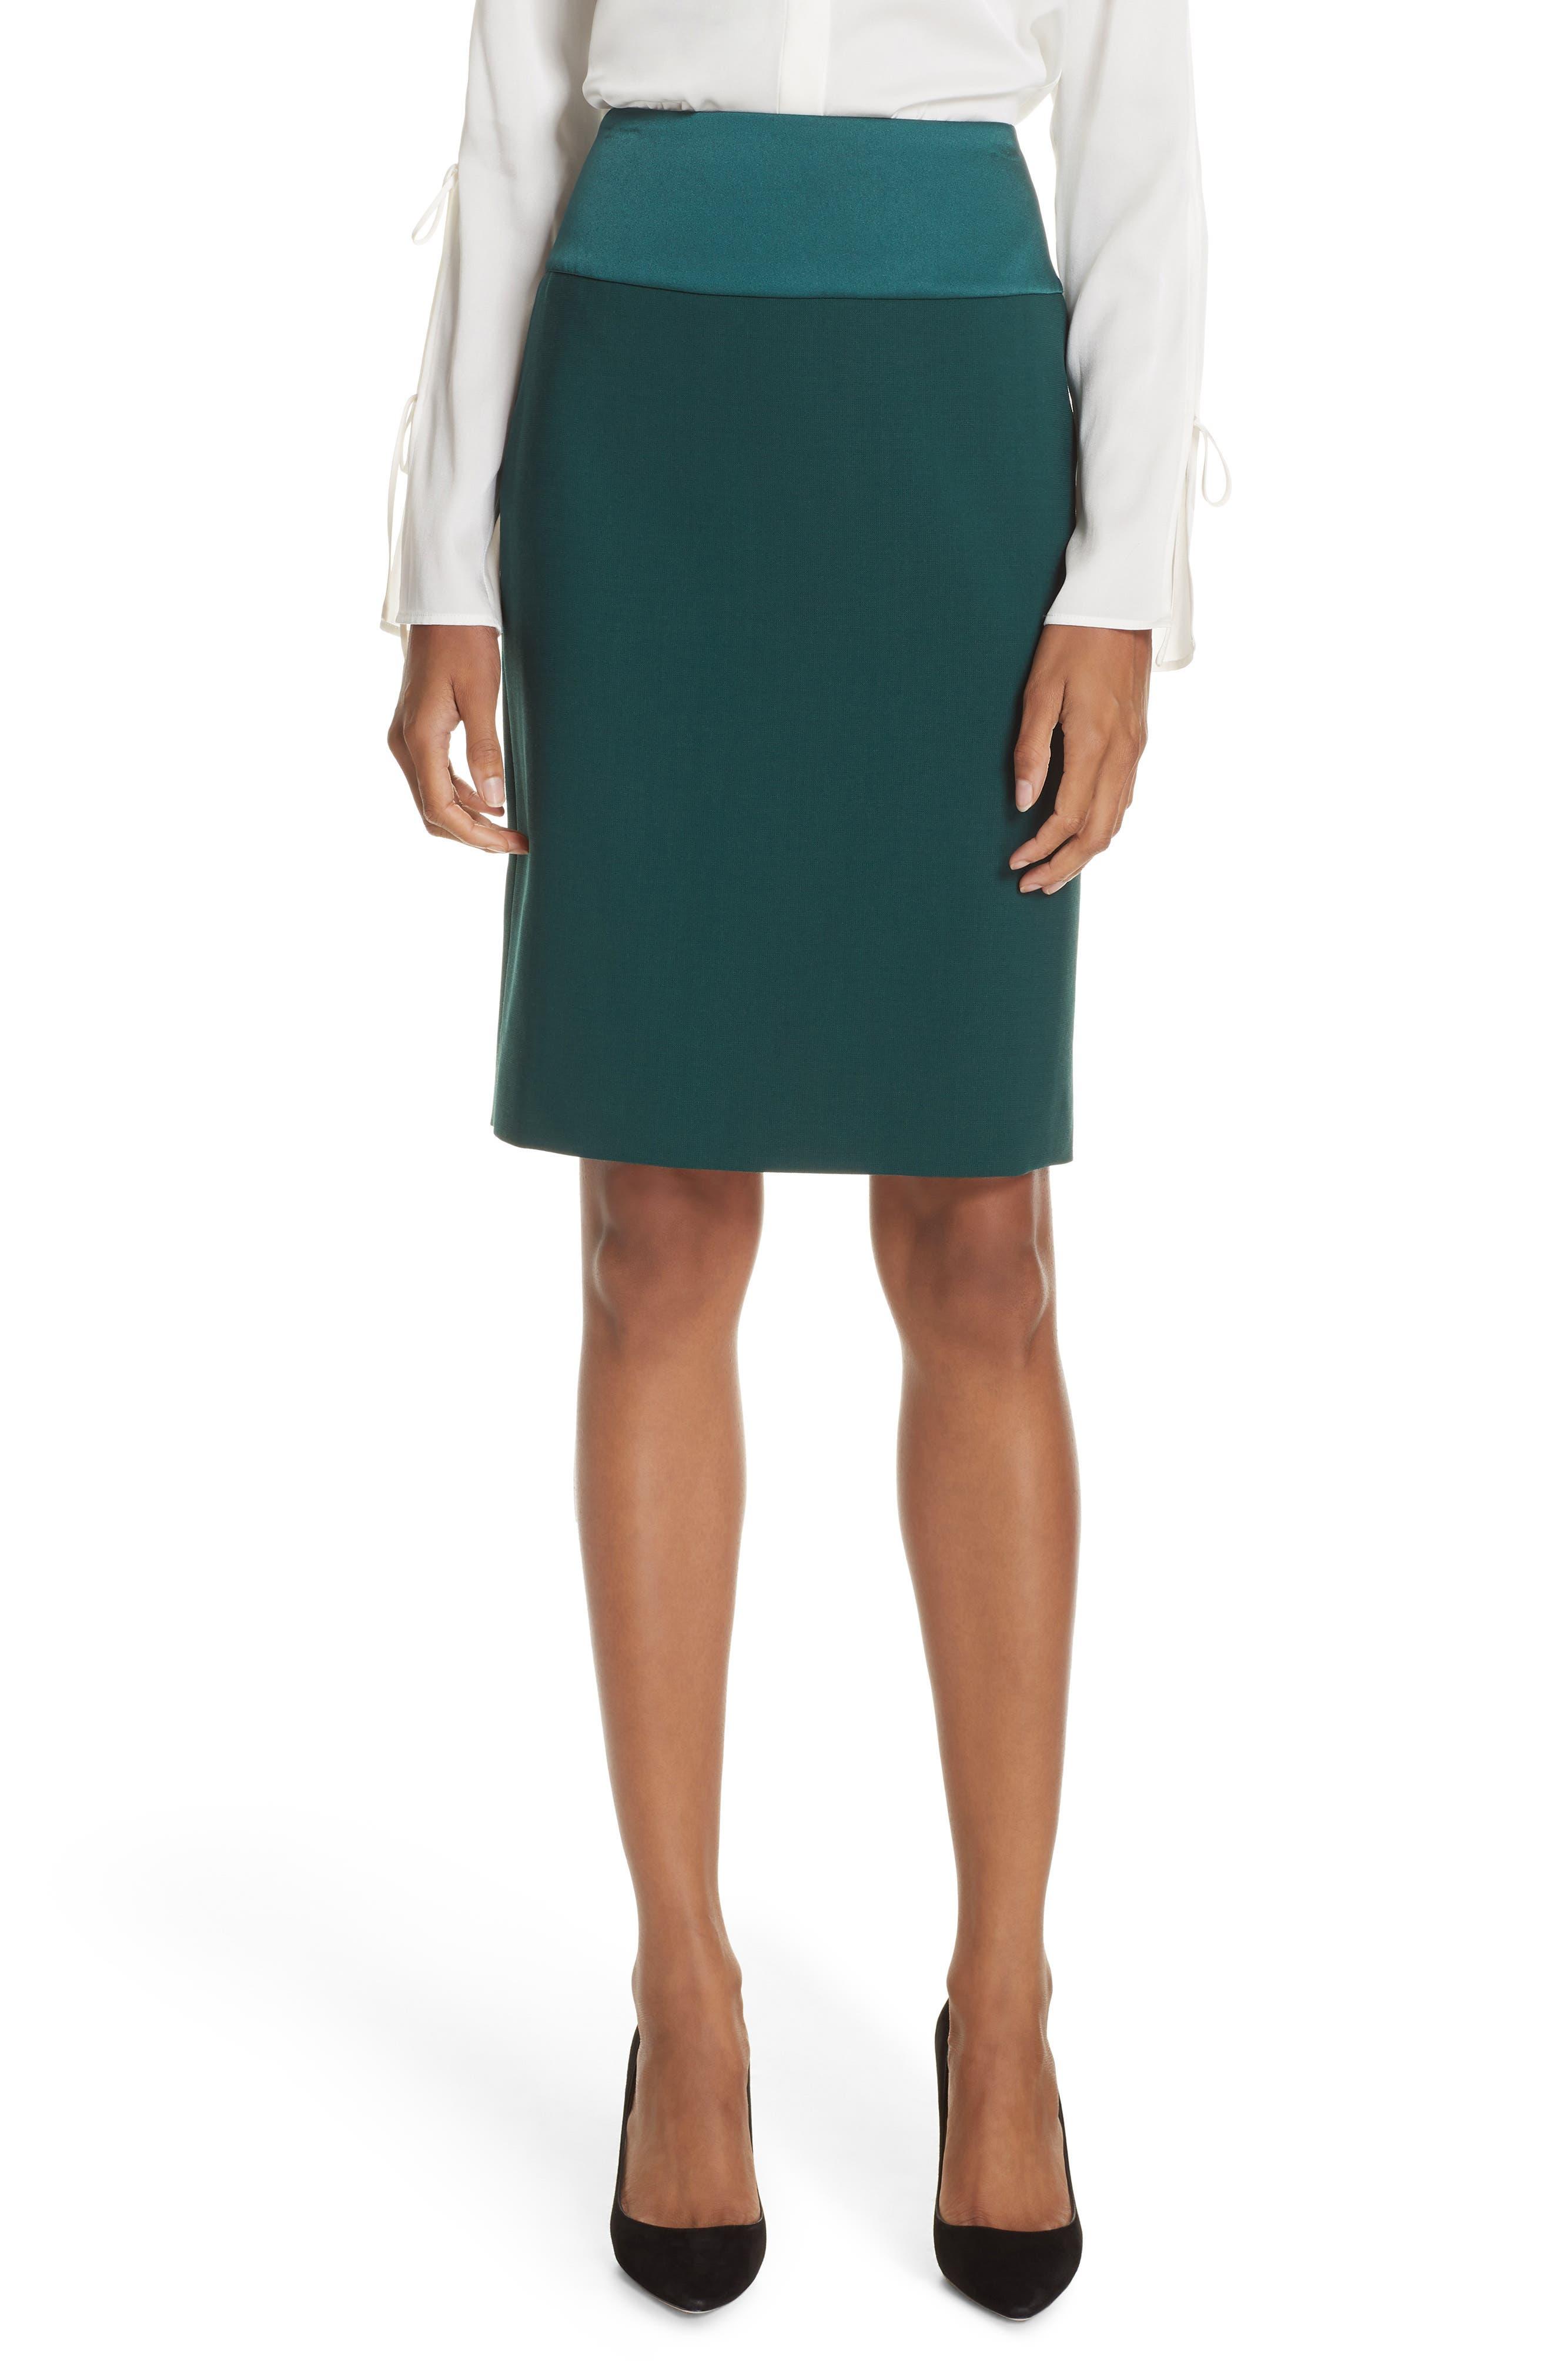 Vanufa Stretch Wool Suit Skirt,                             Main thumbnail 1, color,                             PINE GREEN